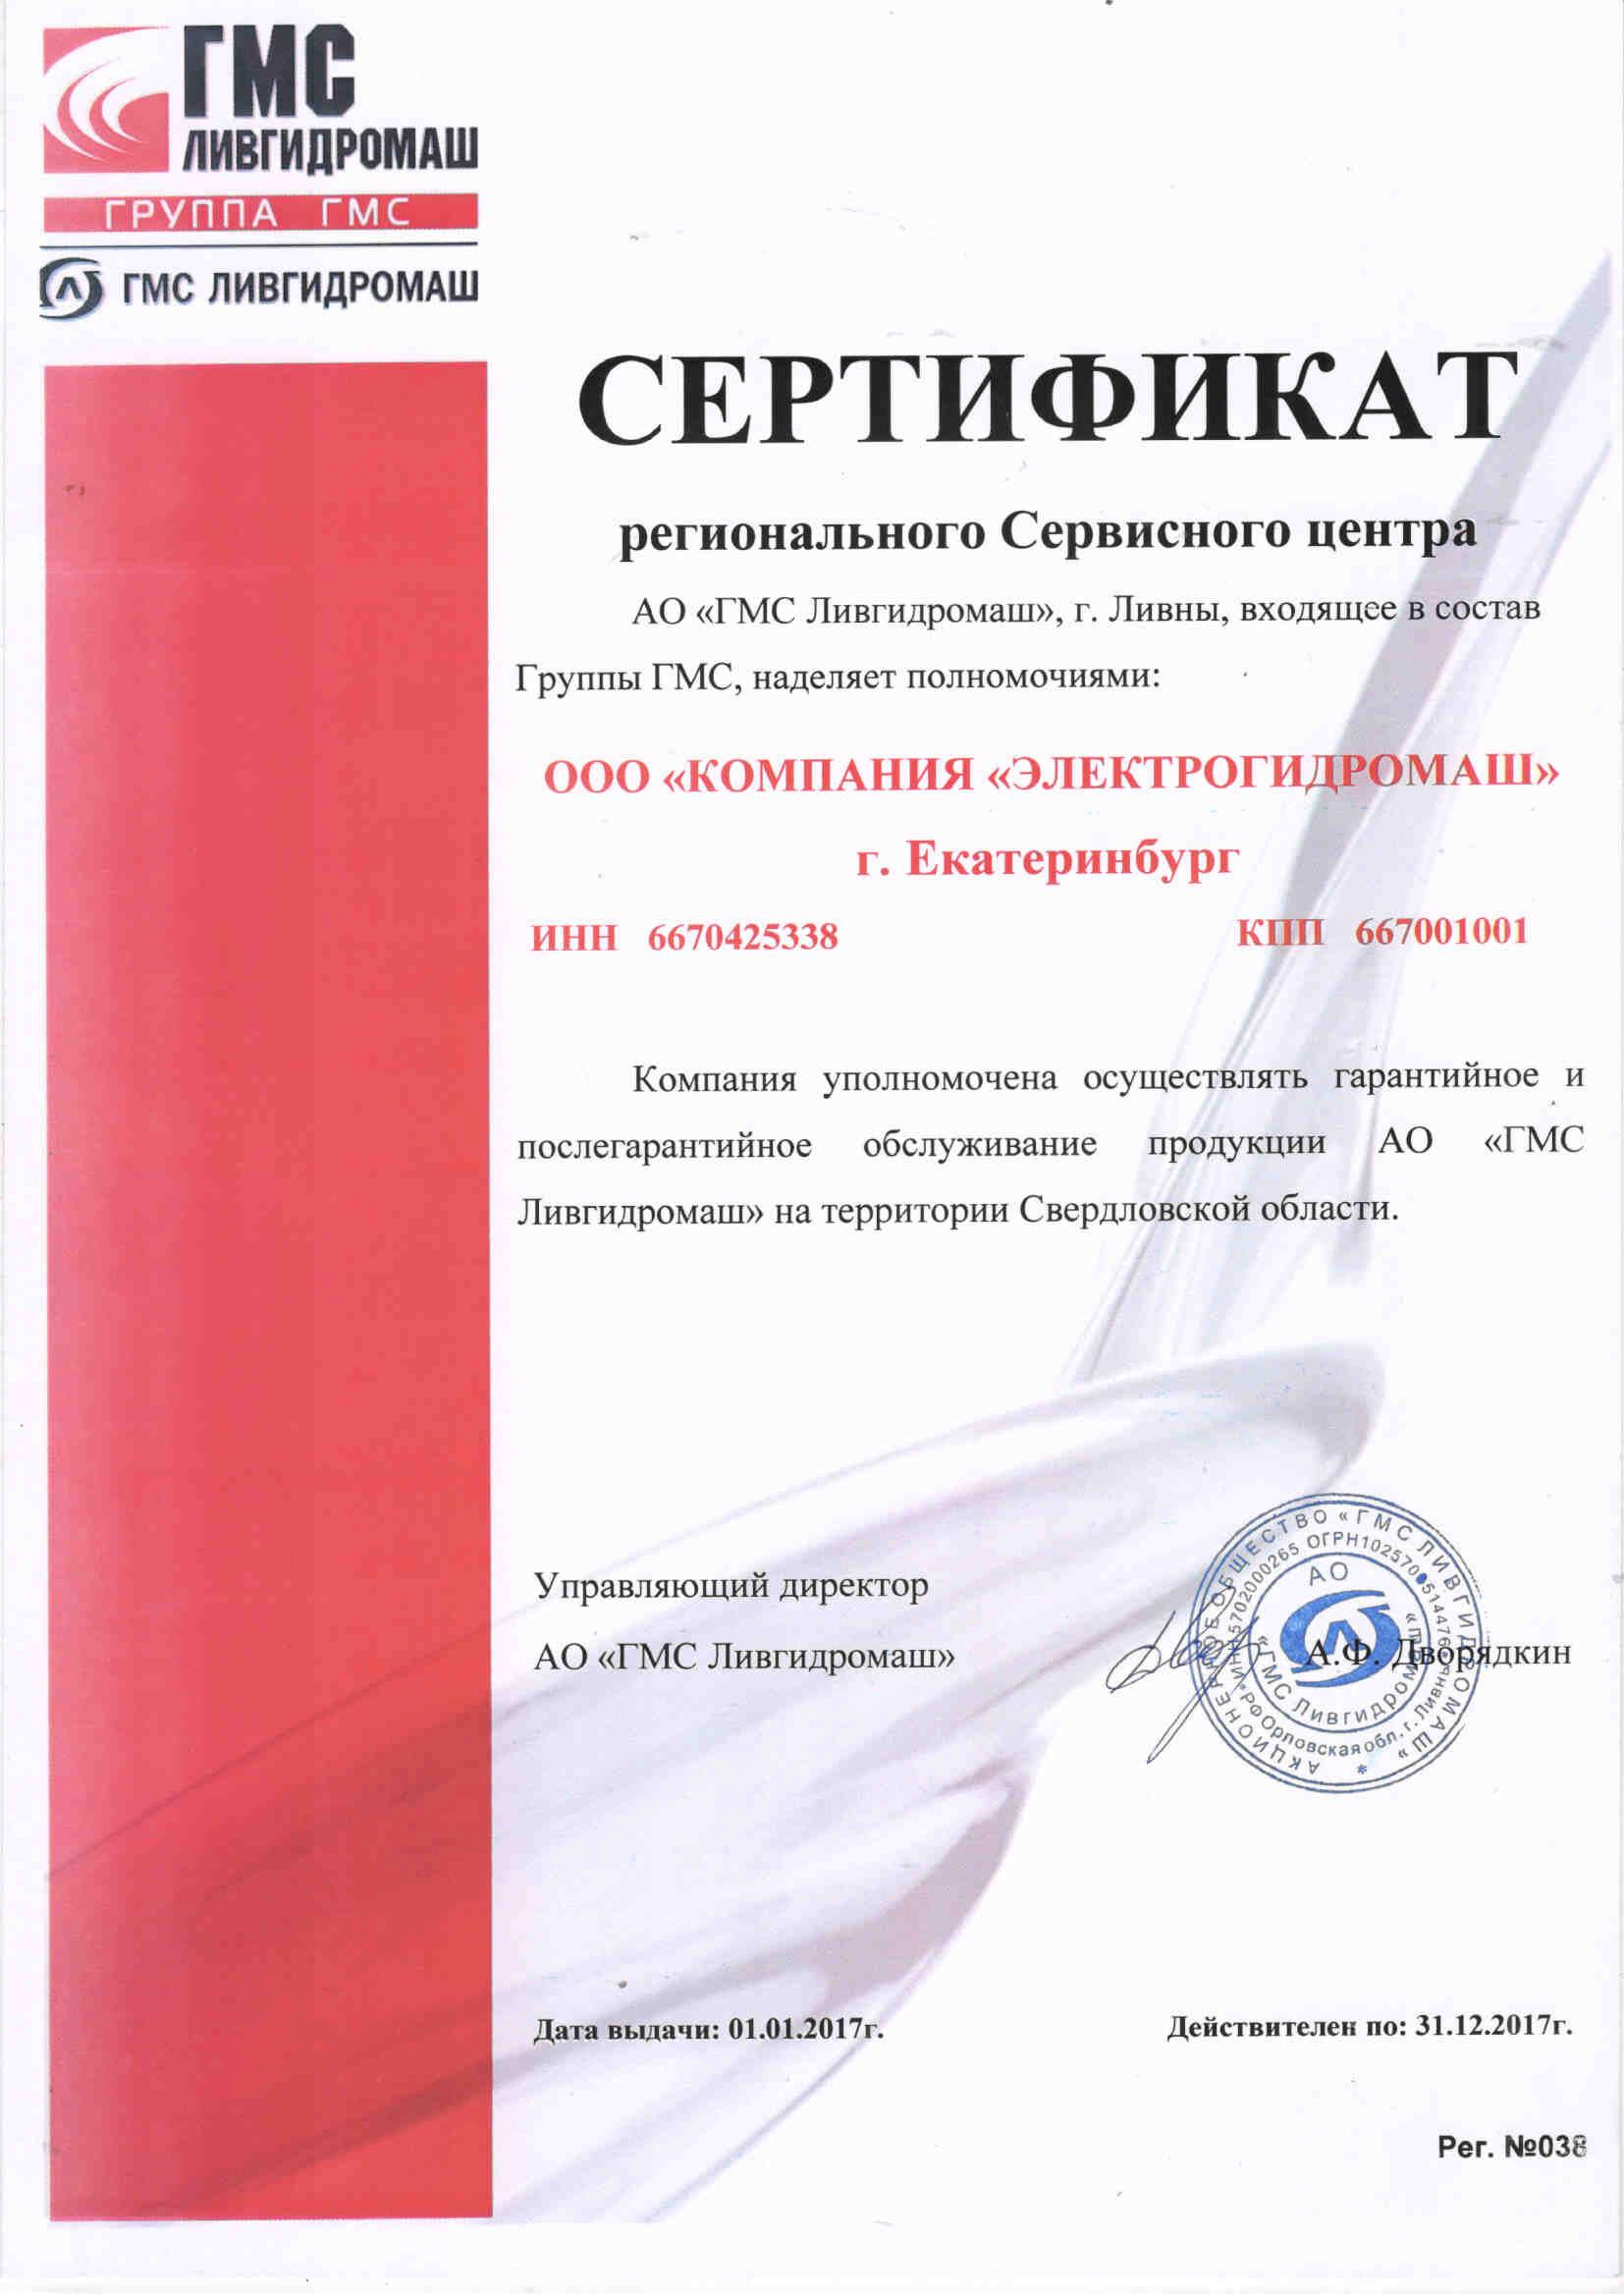 Сертификат сервисного центра ГМС-Ливгидромаш